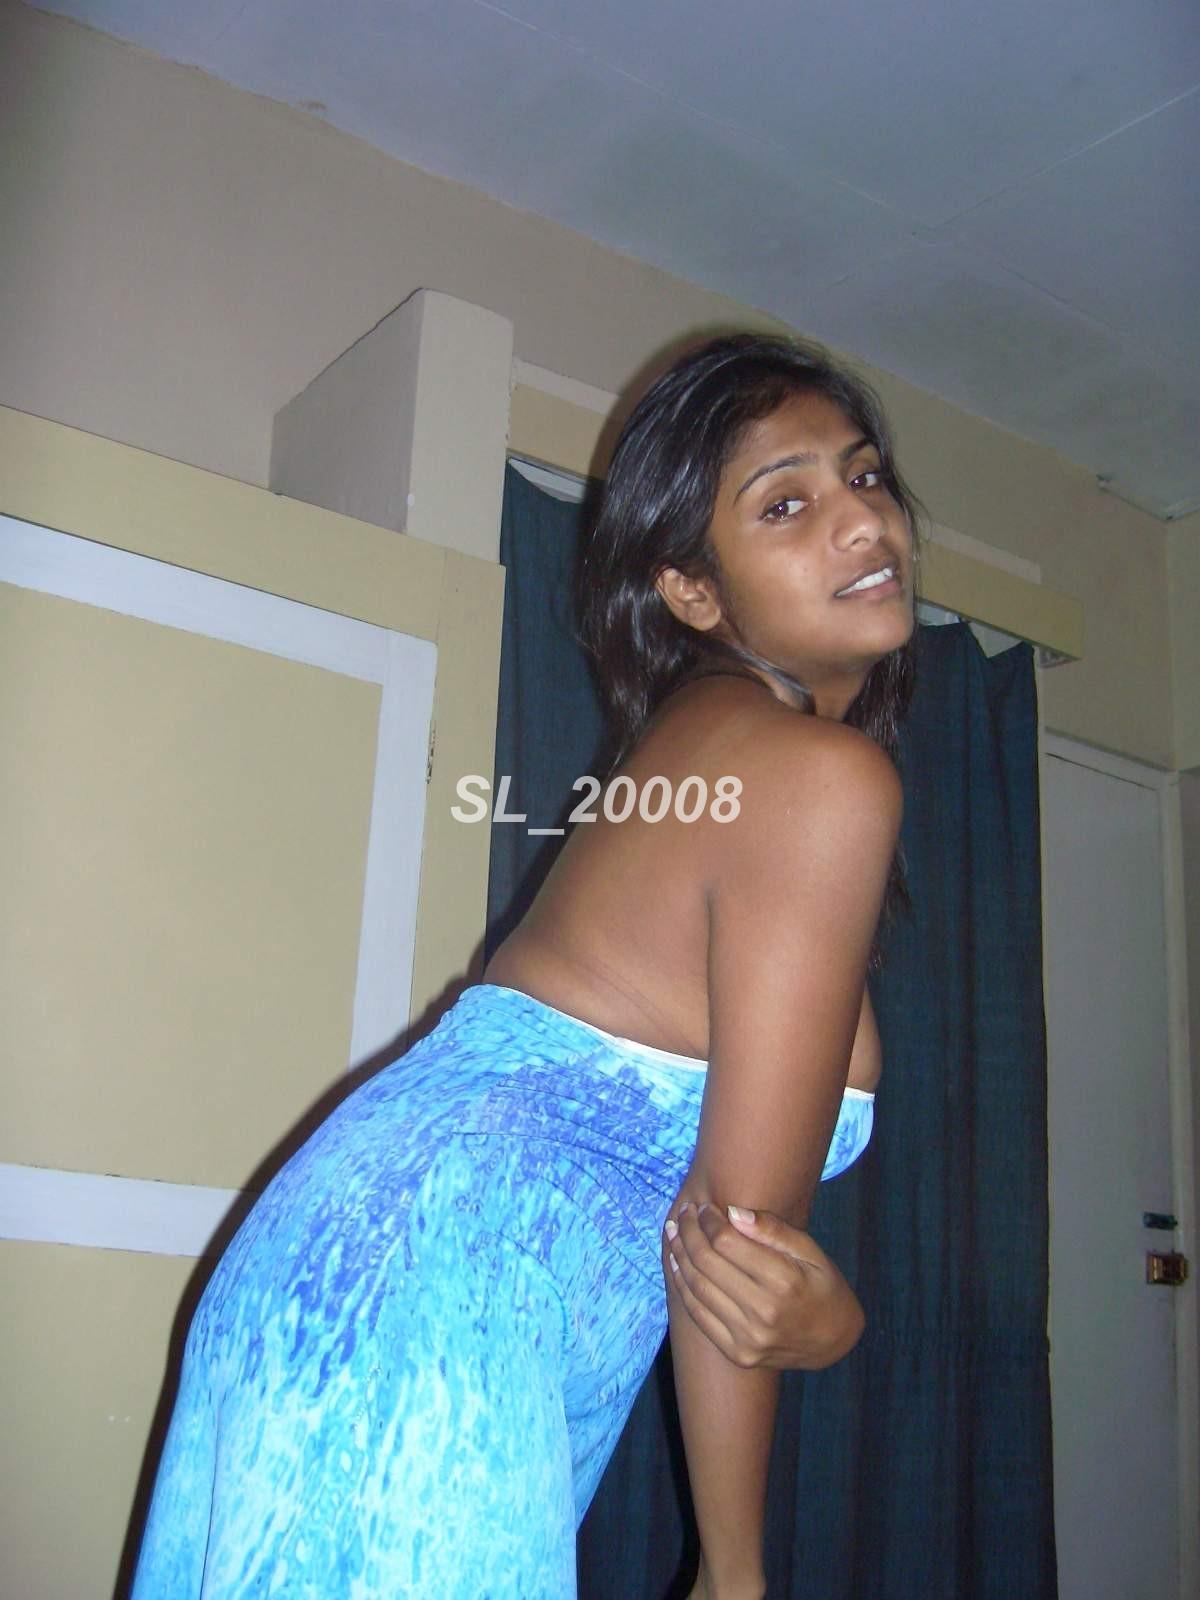 Srilankan colleg girls boobs xxx